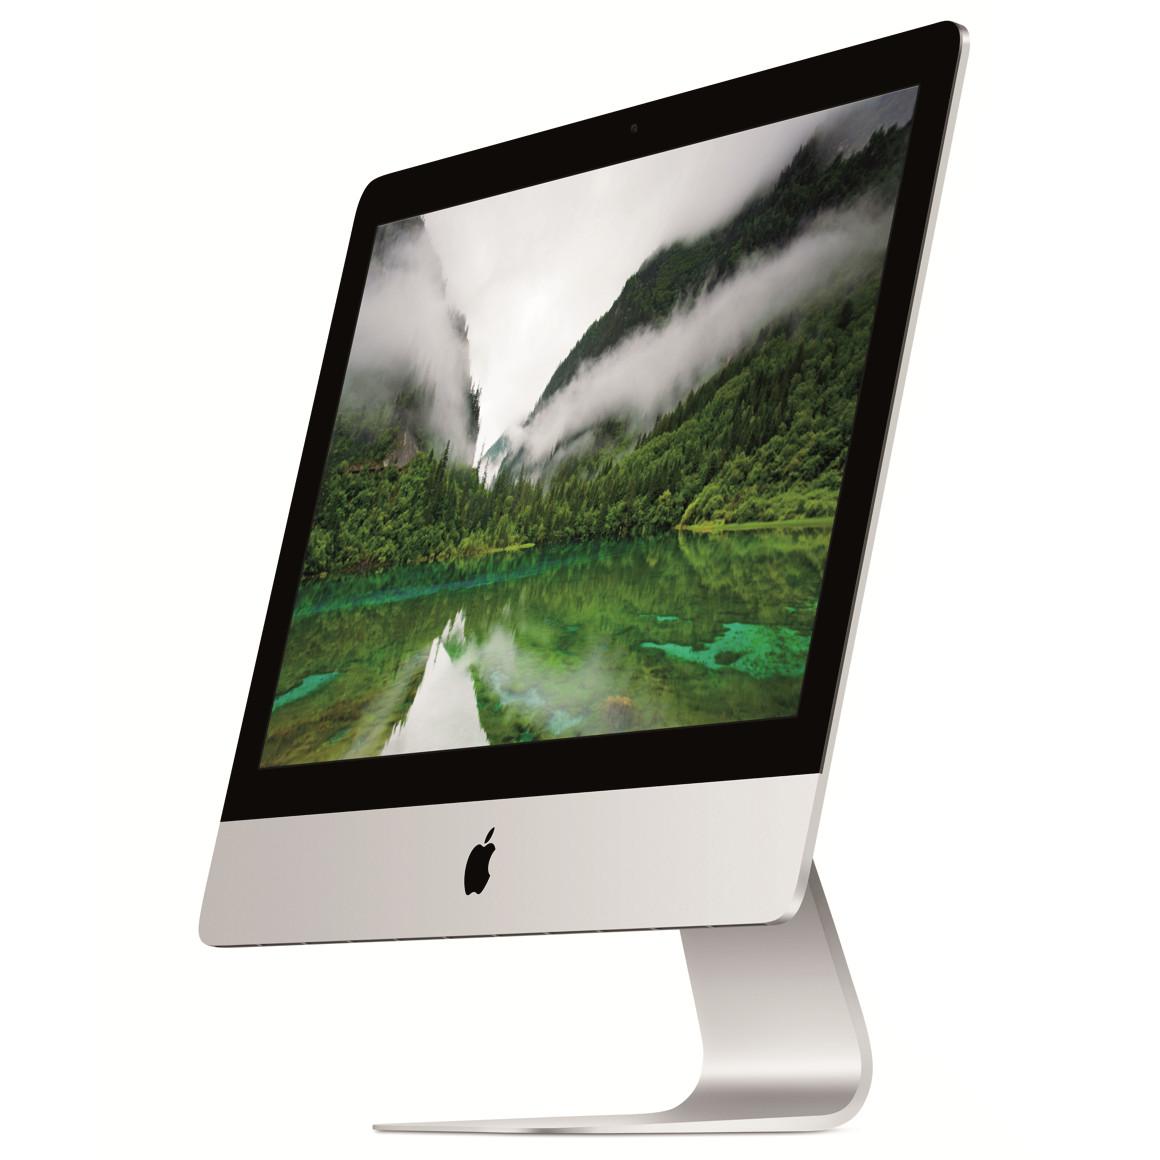 apple imac 21 5 pouces me087f a ordinateur mac apple. Black Bedroom Furniture Sets. Home Design Ideas